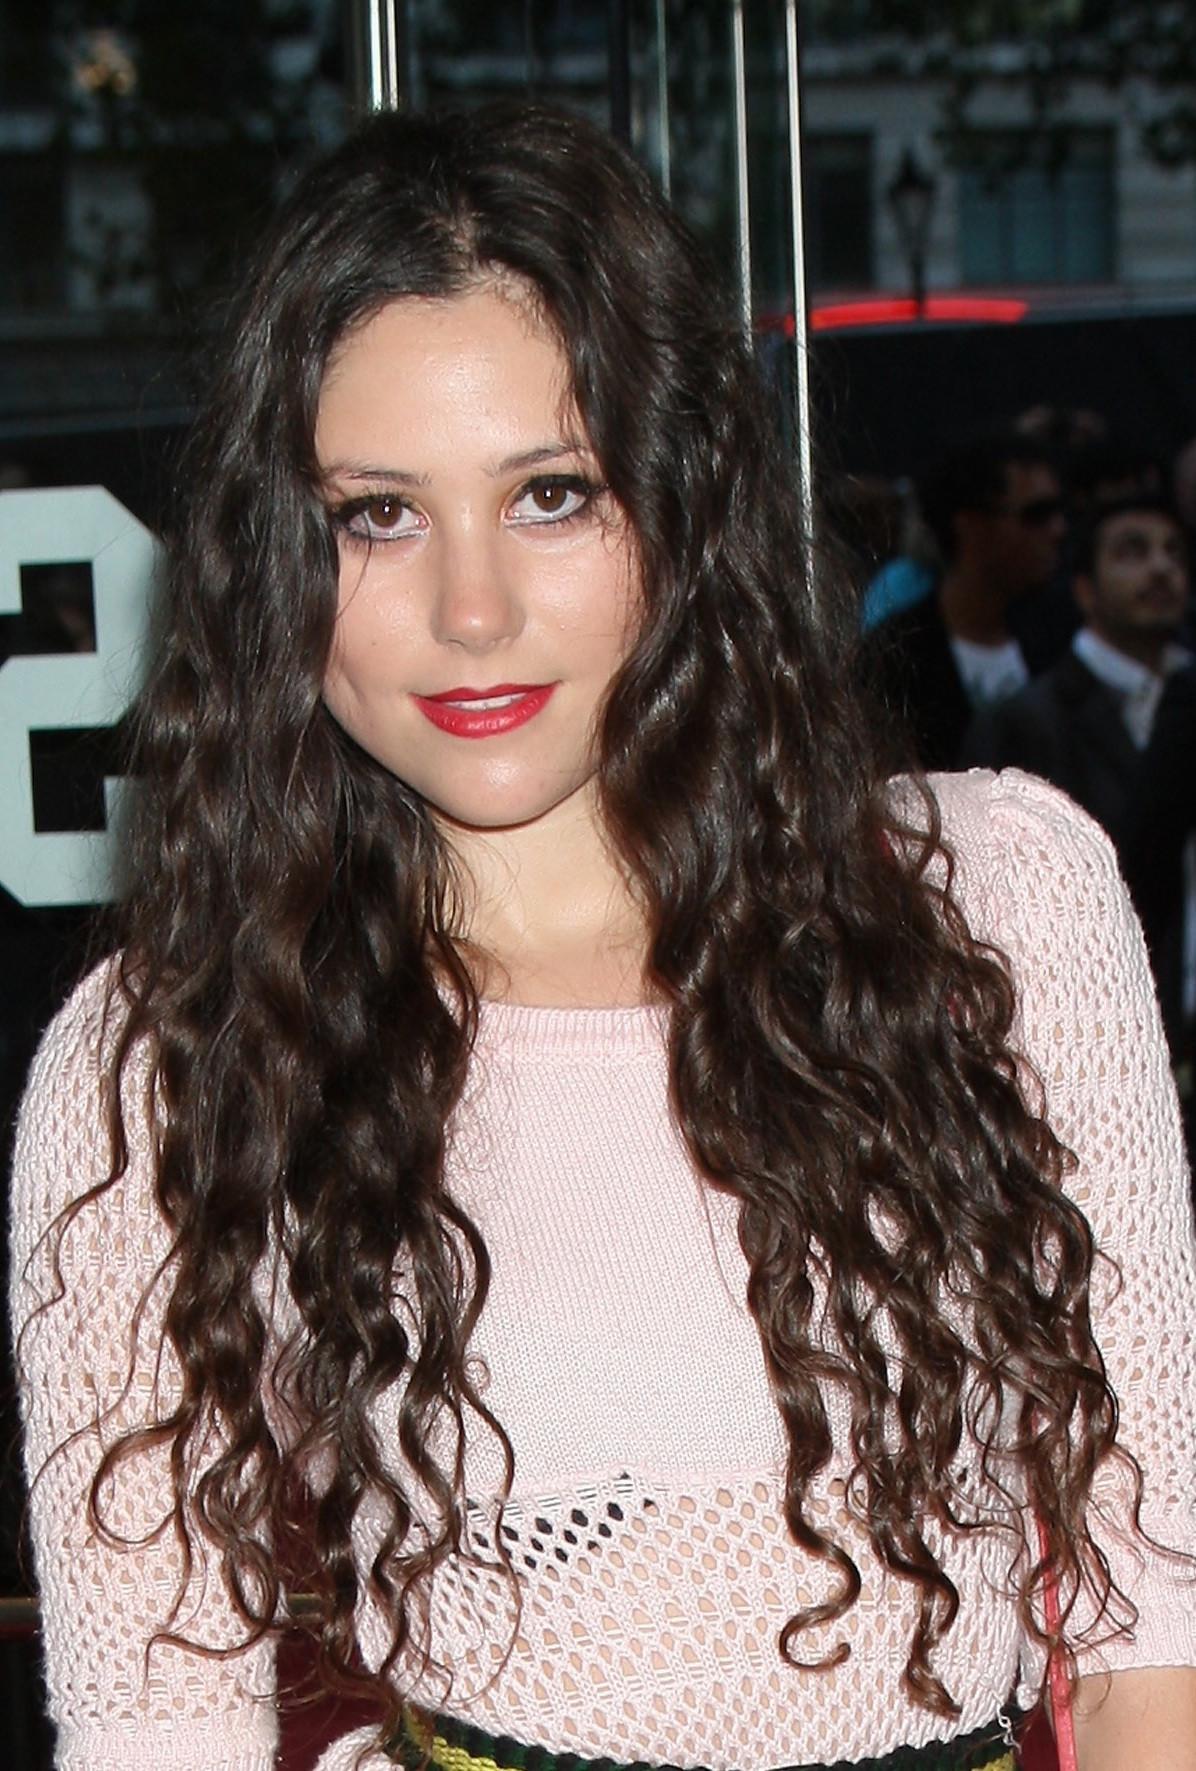 Naturally Curly Hair Hairstyles  Naturally Curly Hairstyles for Women Women Hairstyles